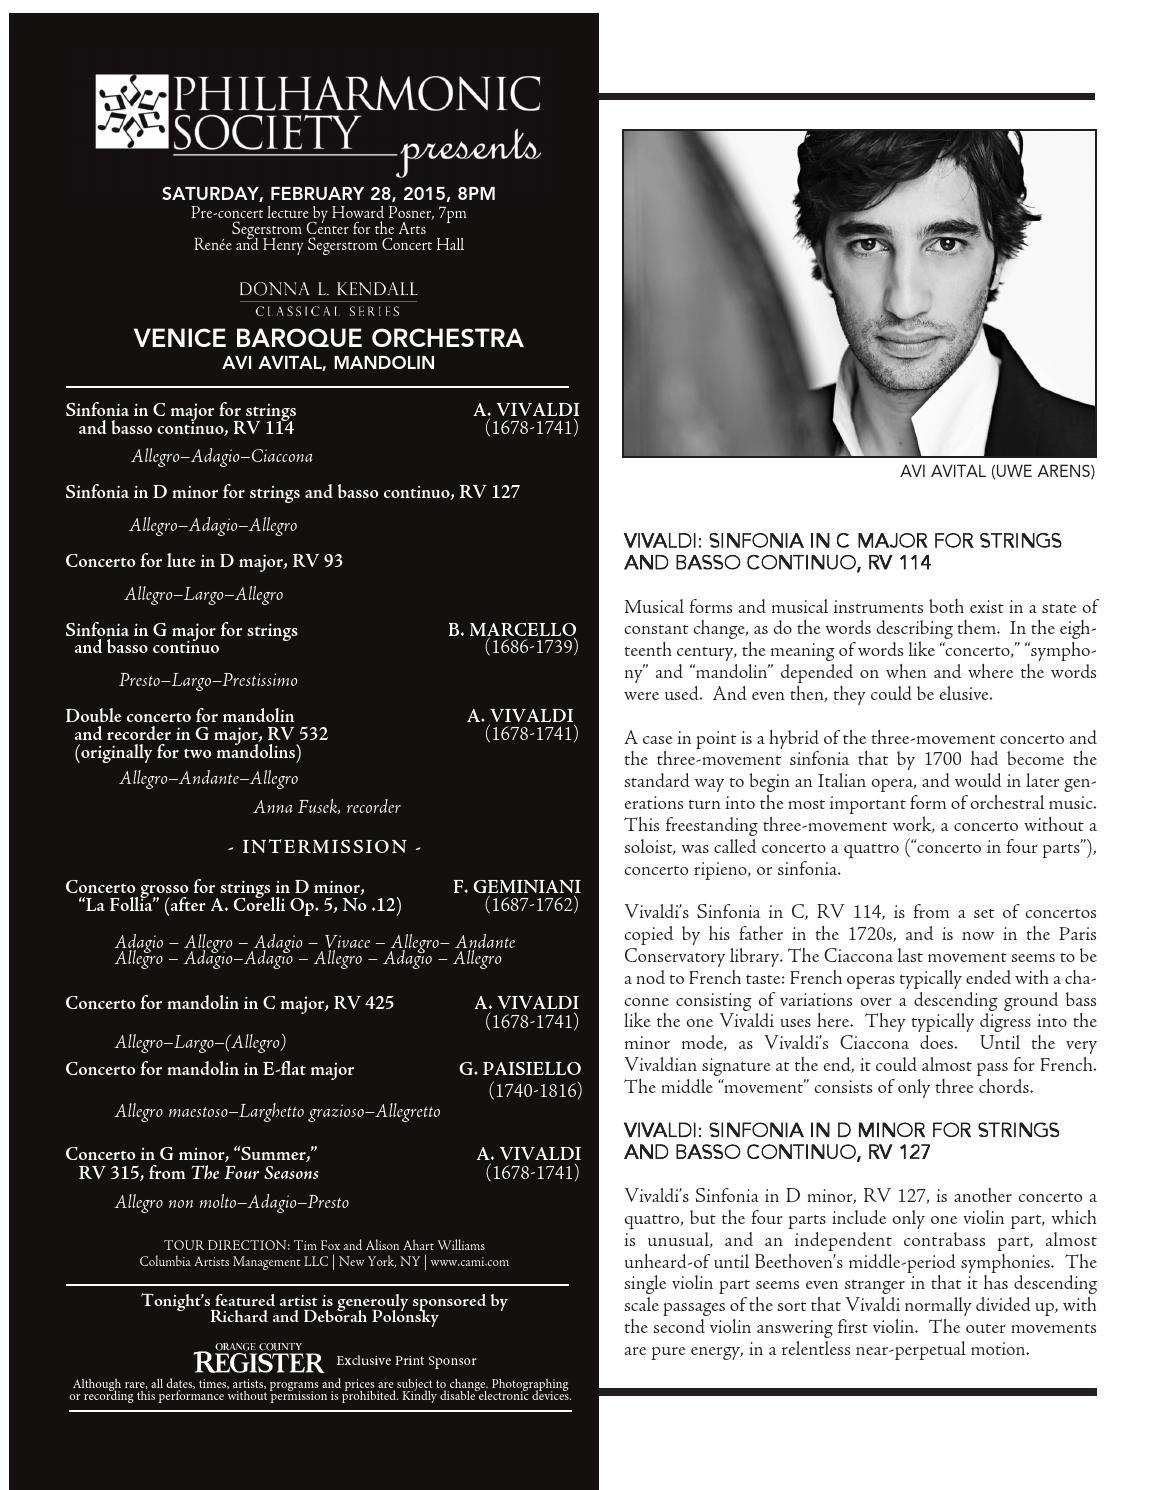 Venice baroque program by Philharmonic Society of Orange